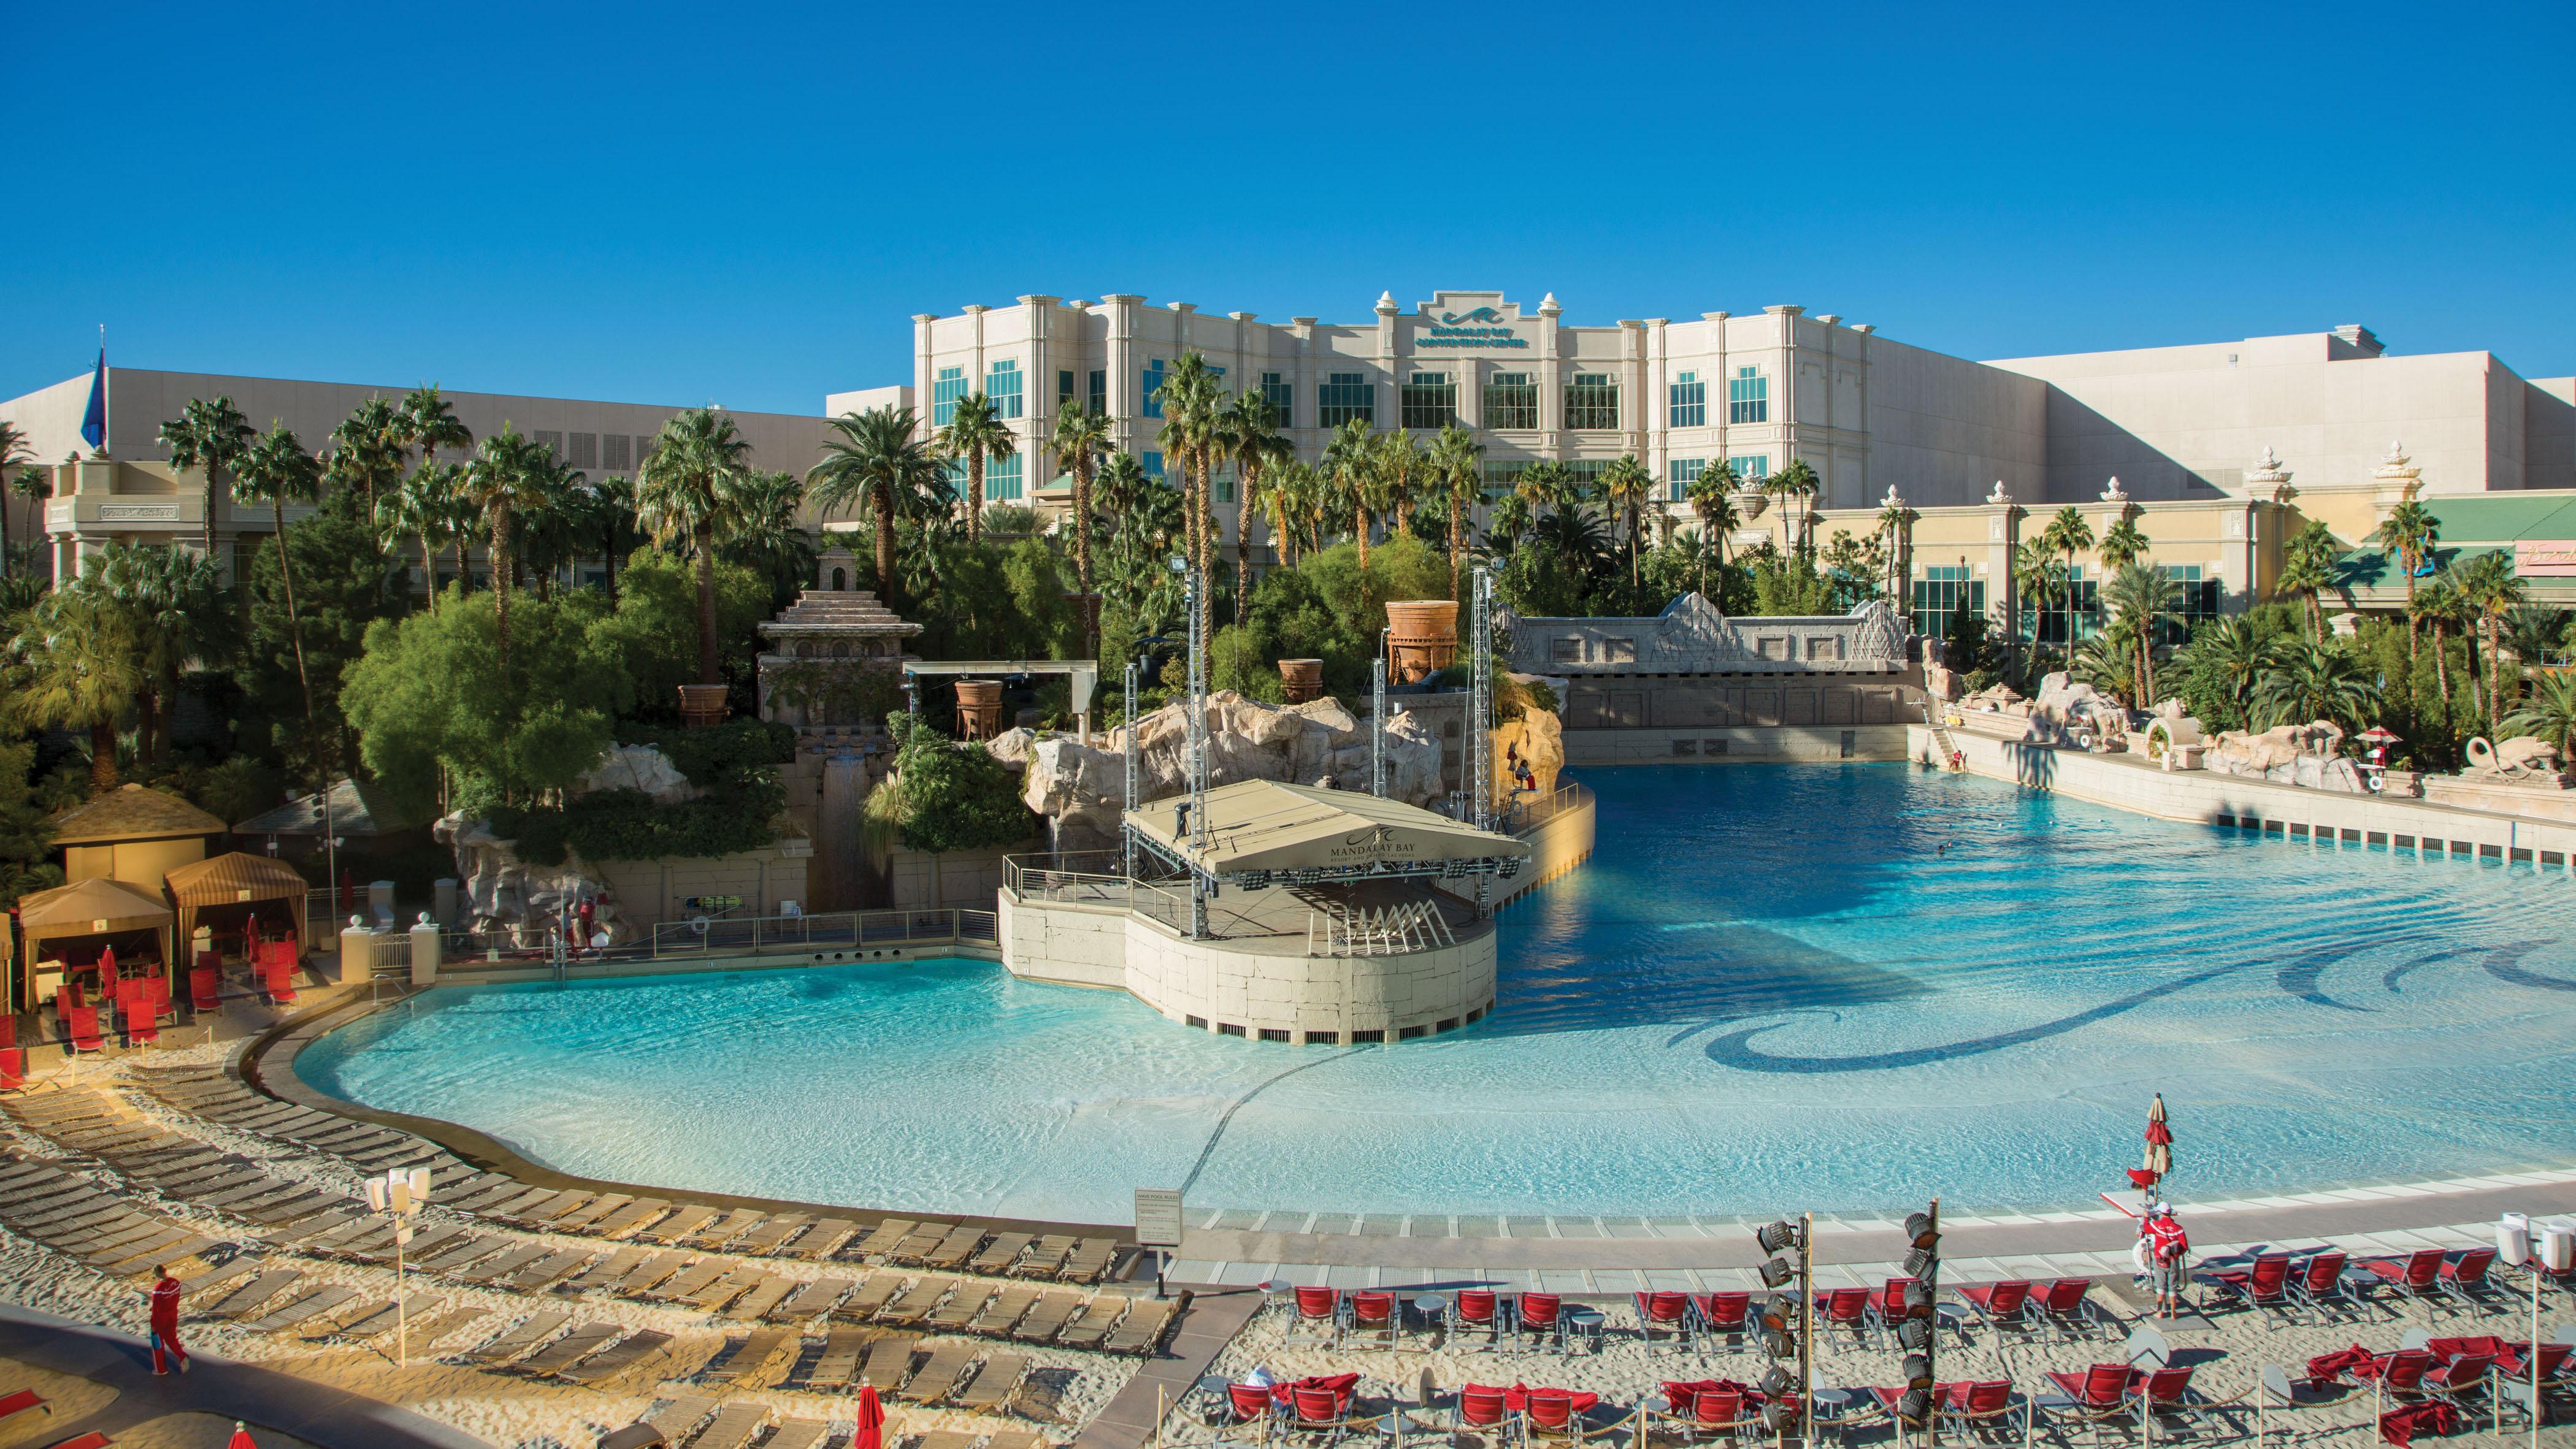 Agua caliente casino rancho mirage california